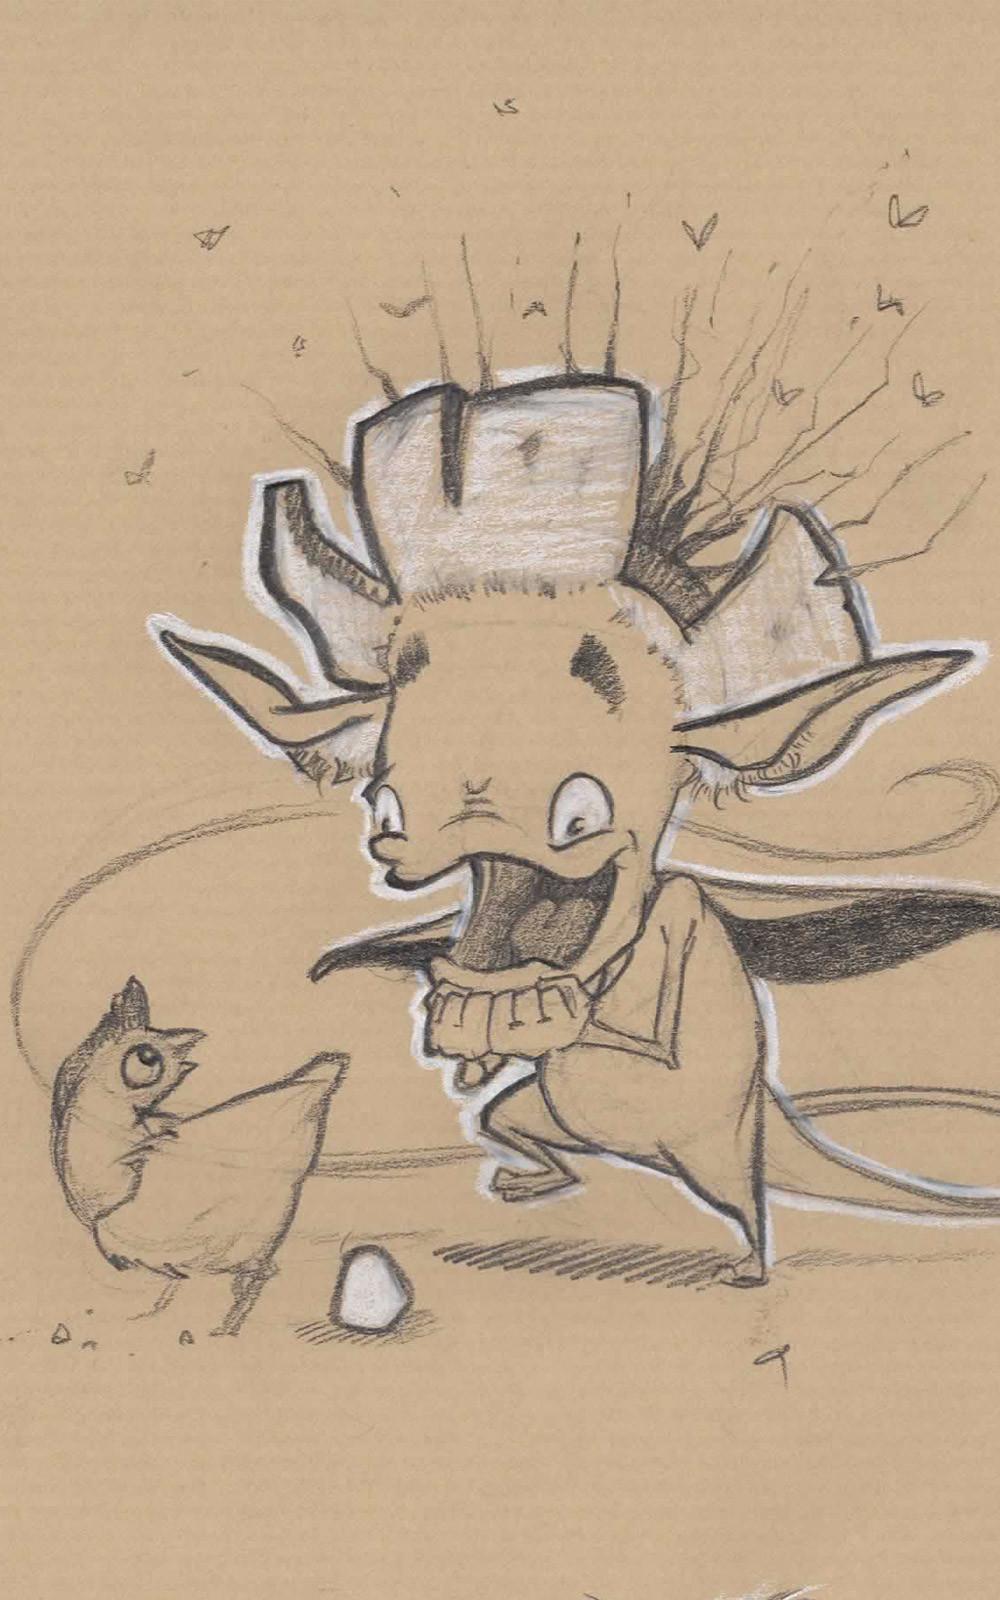 critter Smile positif 5 sketch